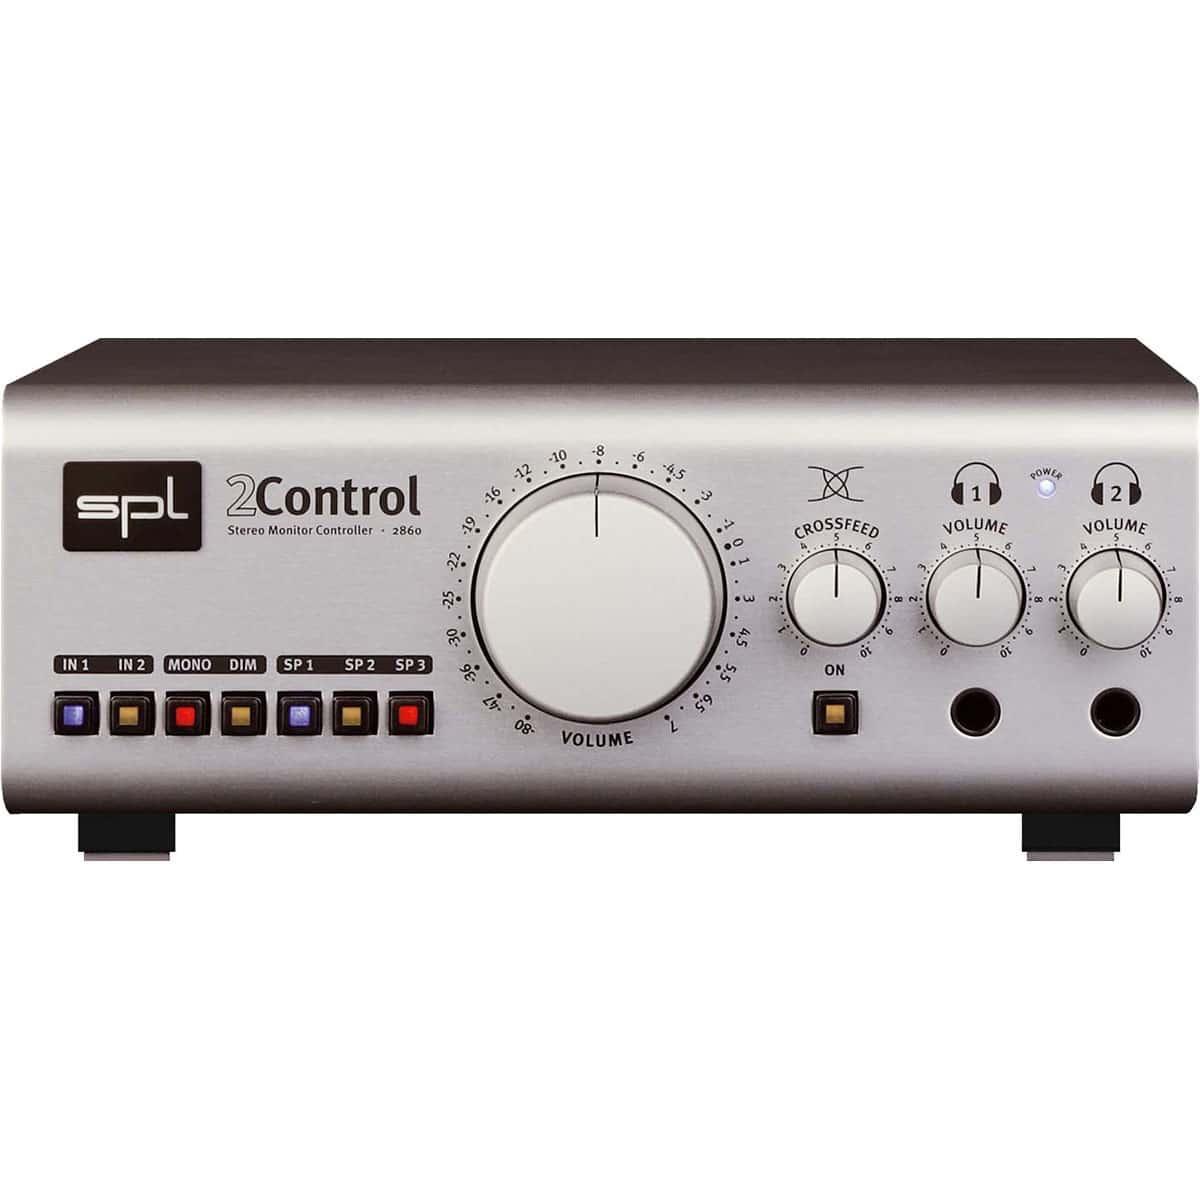 SPL 2 Control 03 SPL 2 Control